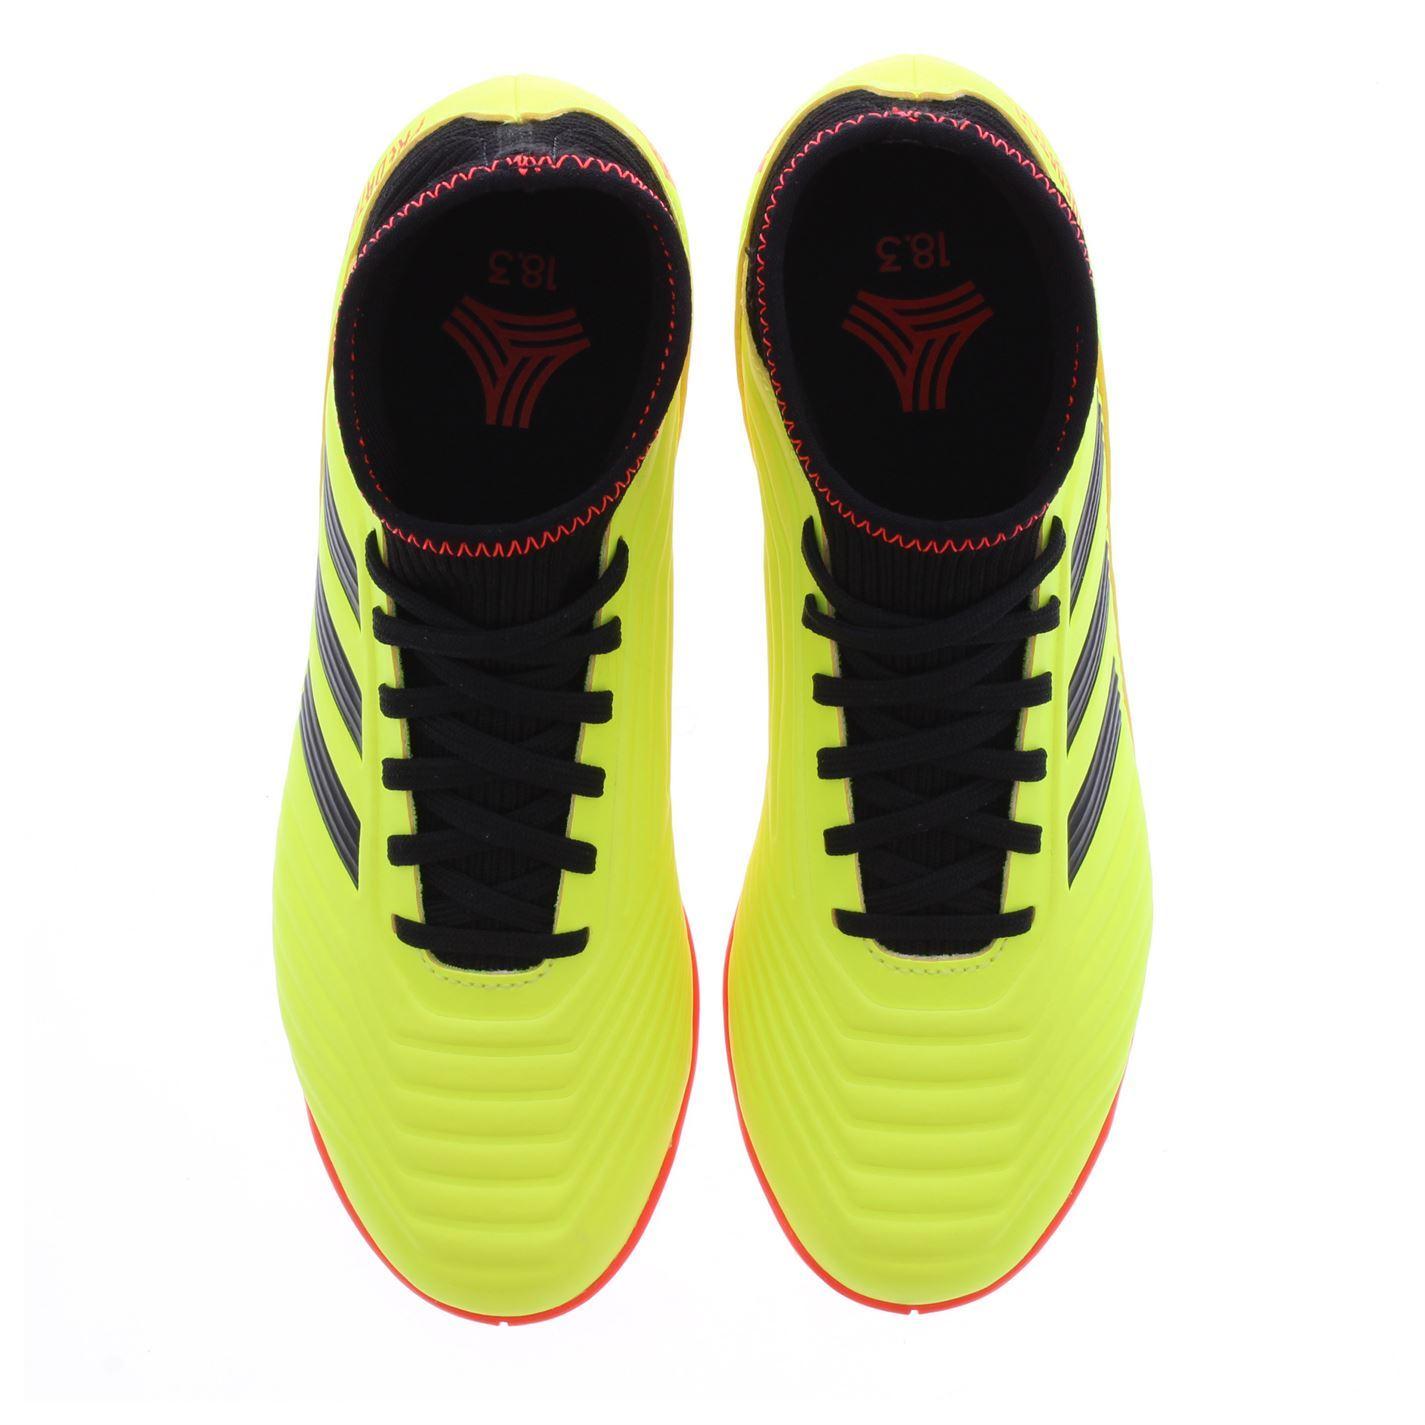 d68448bacea7 ... adidas Predator Tango 18.3 Indoor Football Trainers Juniors Yellow  Soccer Shoes